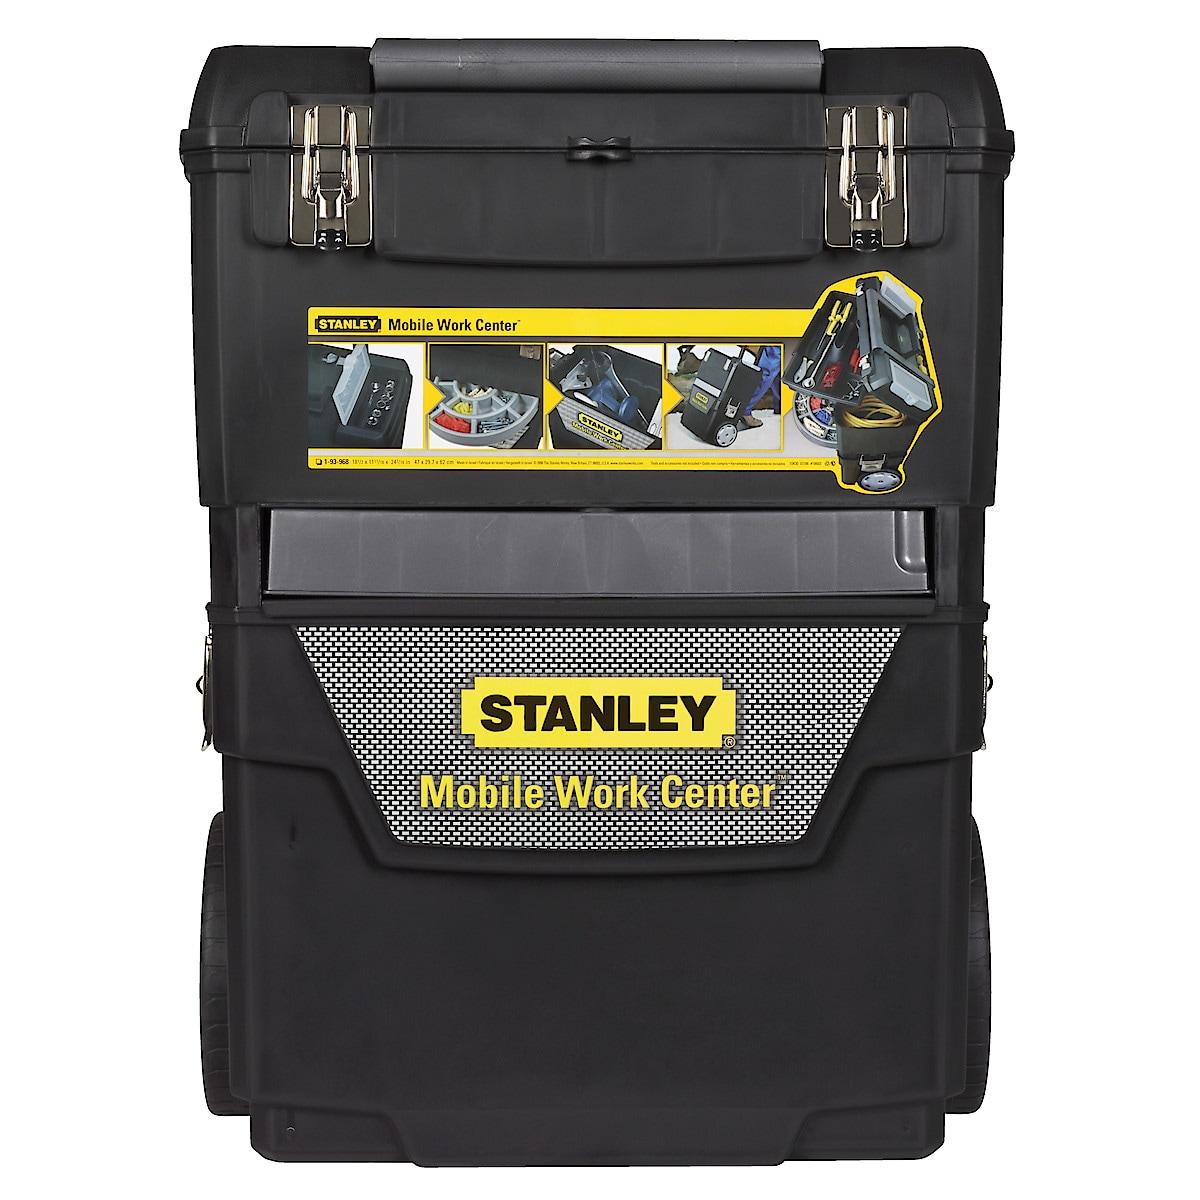 Verktygsvagn Stanley